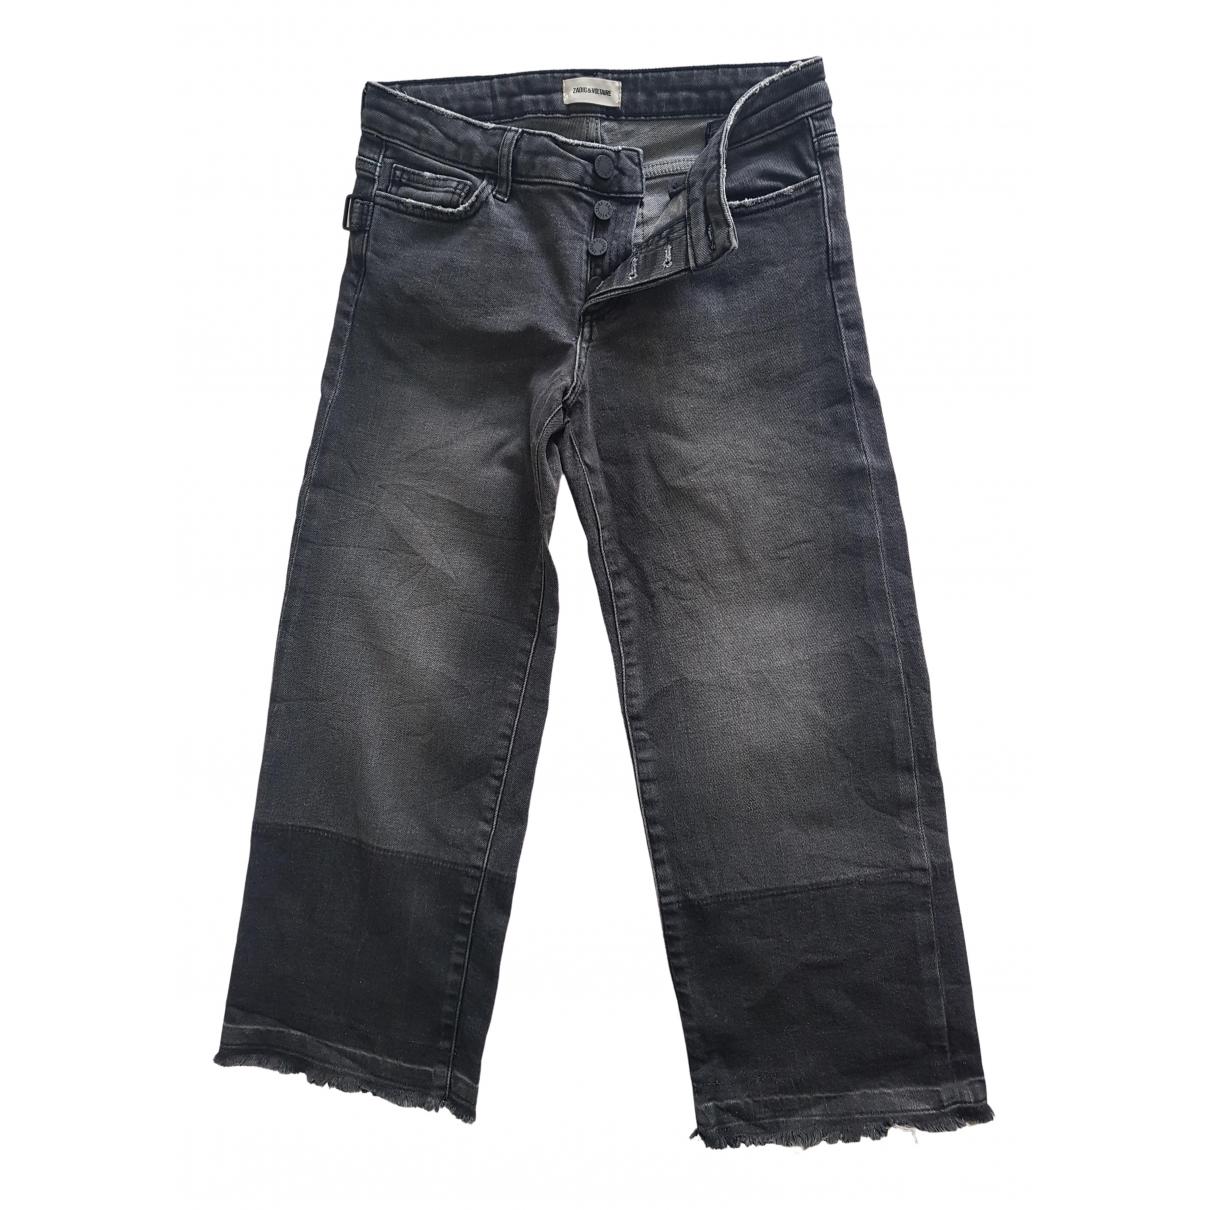 Zadig & Voltaire \N Grey Denim - Jeans Jeans for Women 24 US